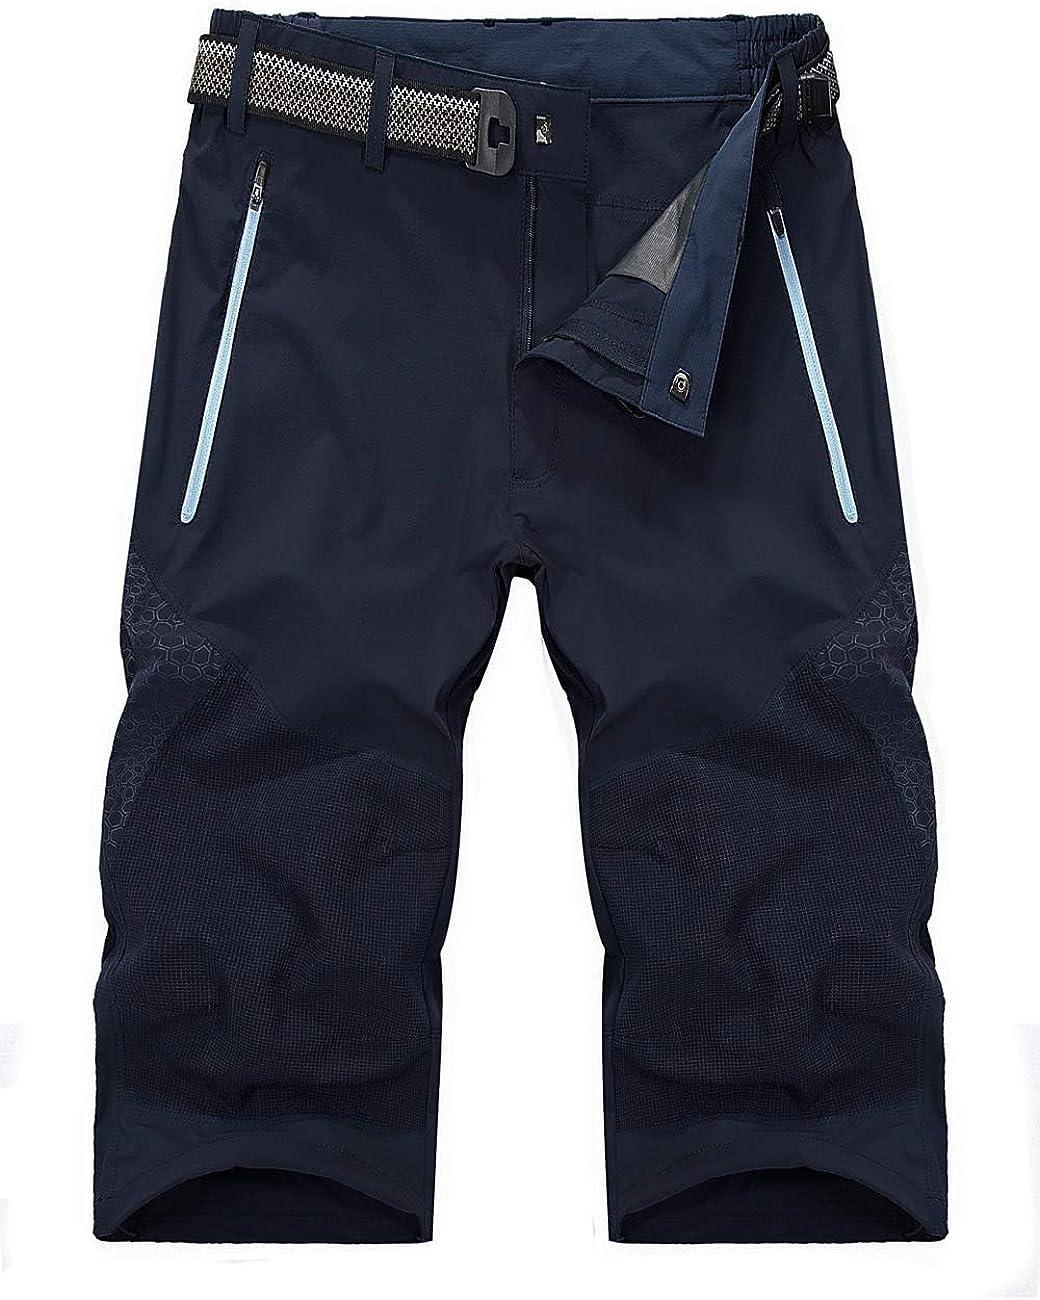 Mens Outdoor Stretch Waist Thin Quick Drying Shorts Lightweight Slim Fit Cargo Shorts (No Belt)